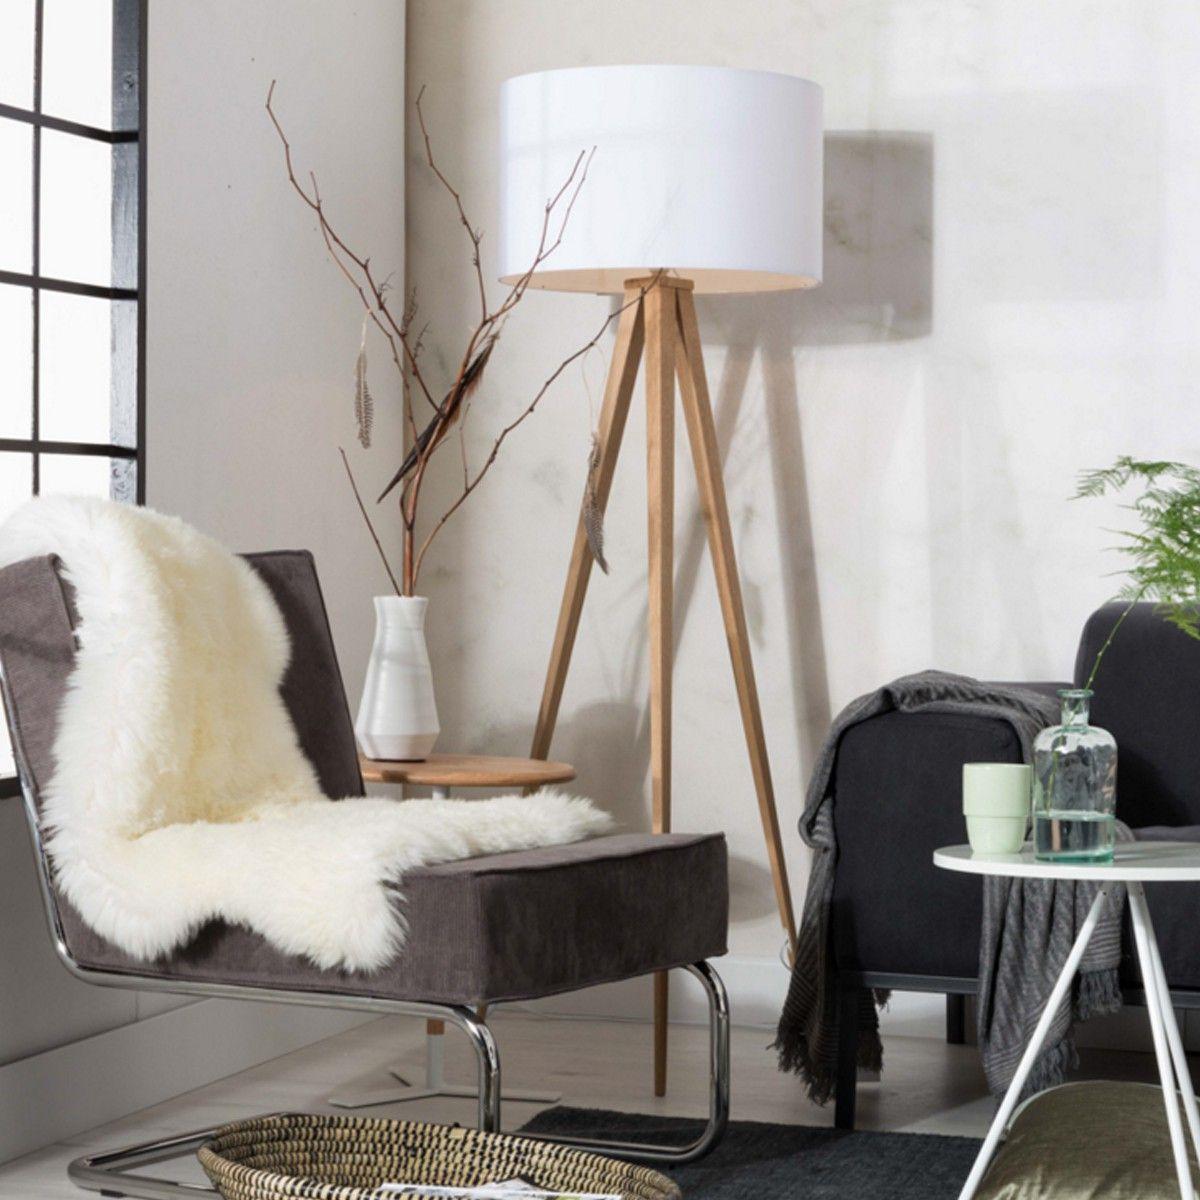 Lampe Tripod En Bois Blanc Zuiver Lampes Salon Eclairage Du Salon Lampadaire Chambre